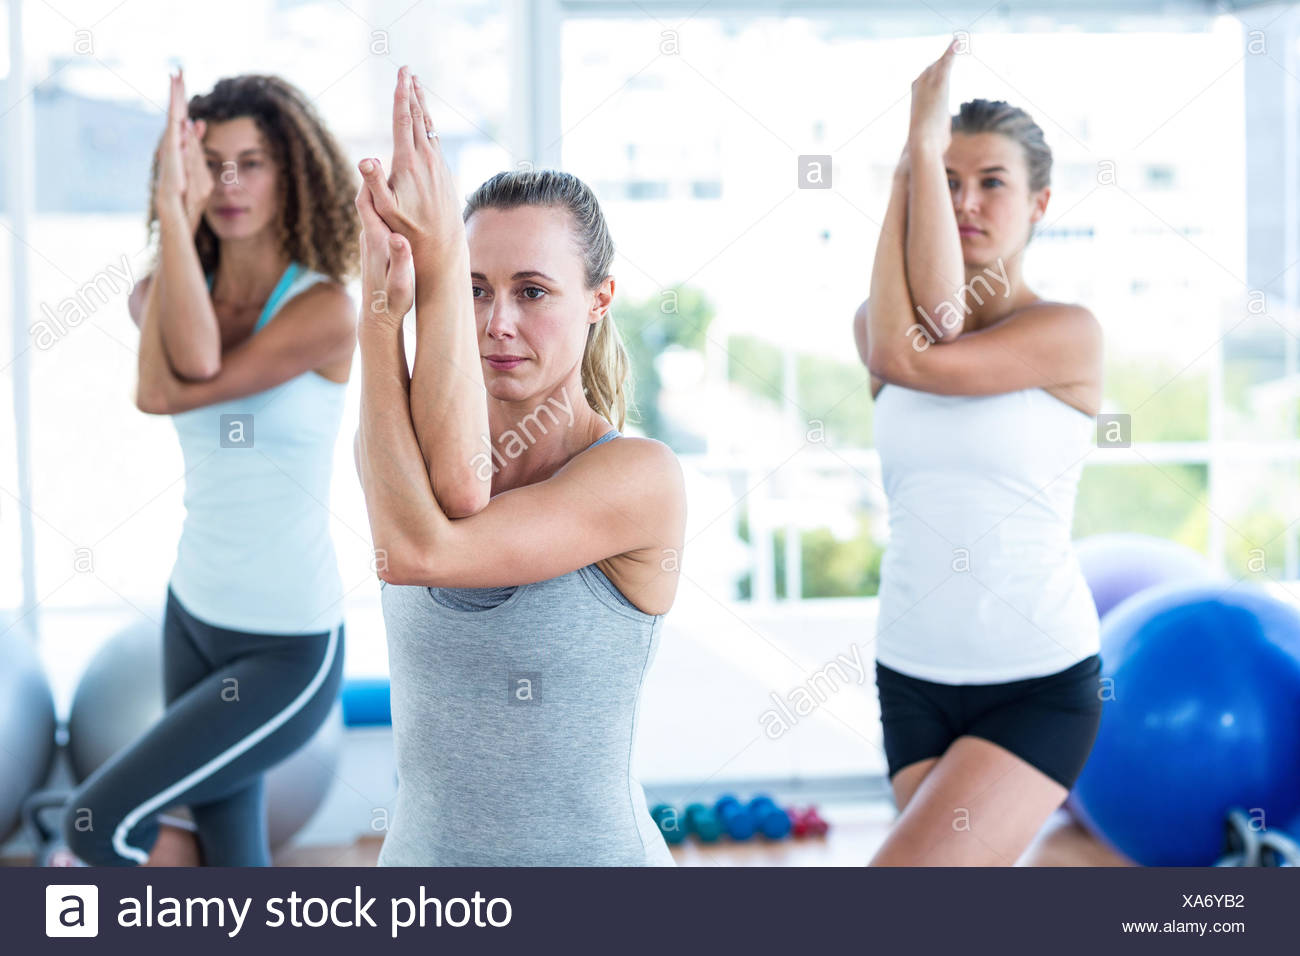 Women doing eagle pose - Stock Image